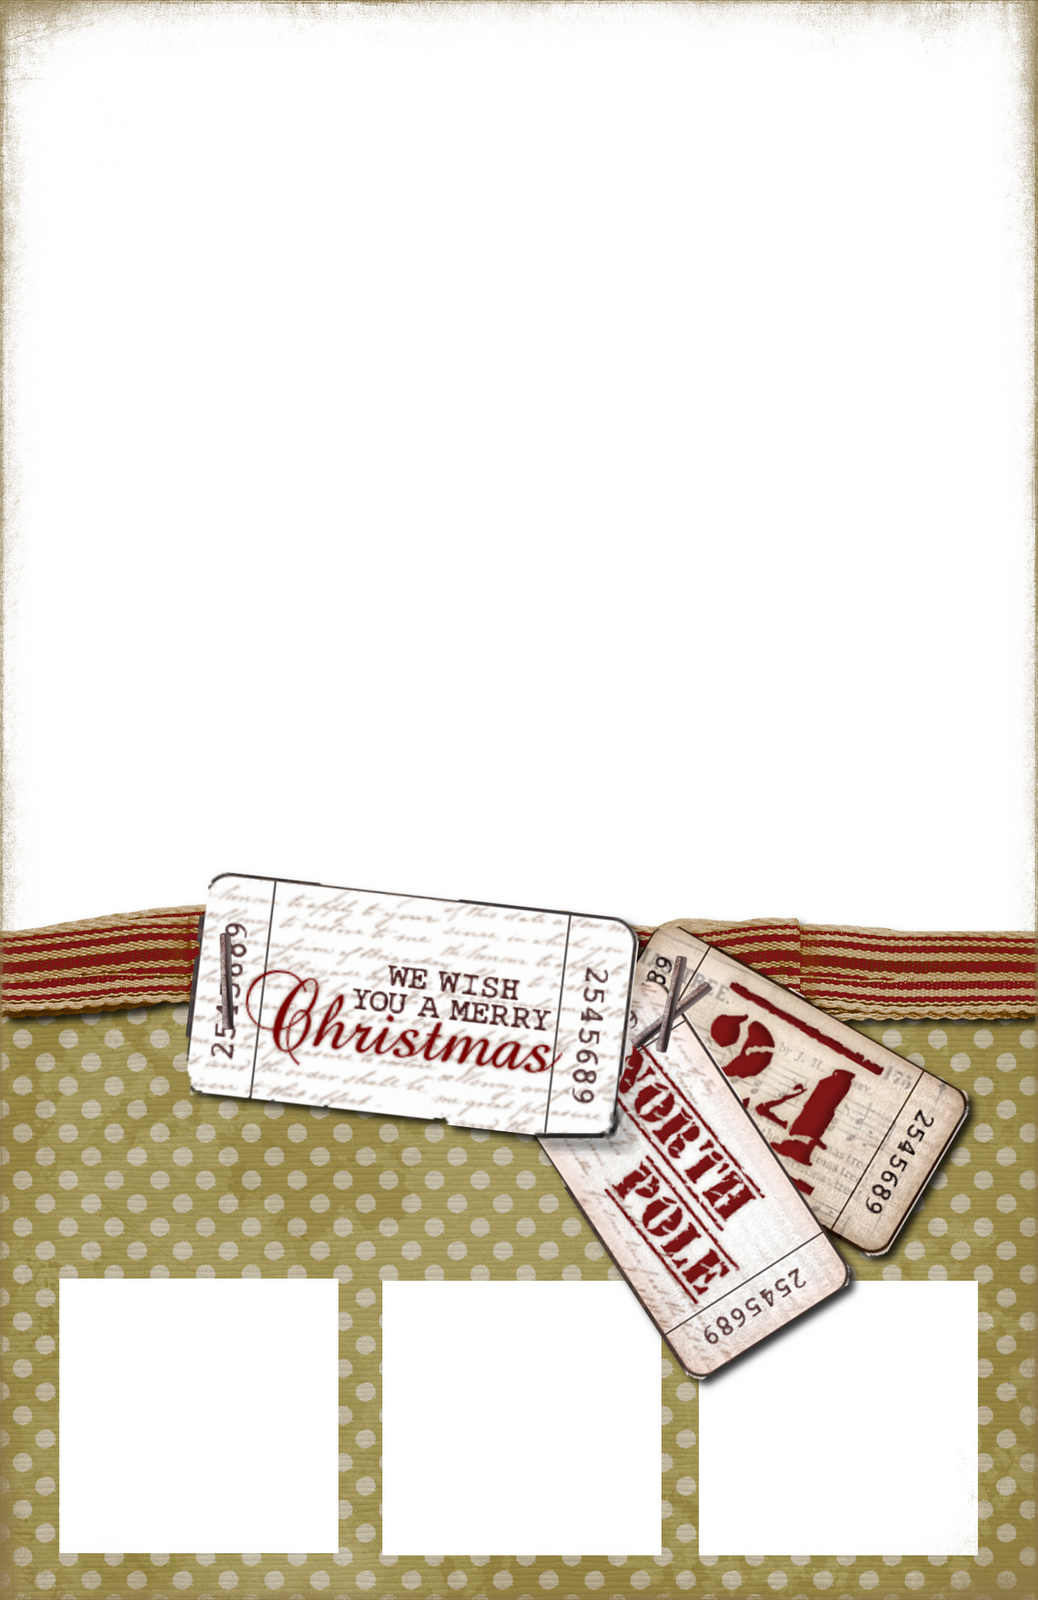 https://i0.wp.com/1.bp.blogspot.com/_gig0Pr1Fu4c/TPZdsice6EI/AAAAAAAACZg/H58QchdZyv8/s1600/Christmas+tickets.png